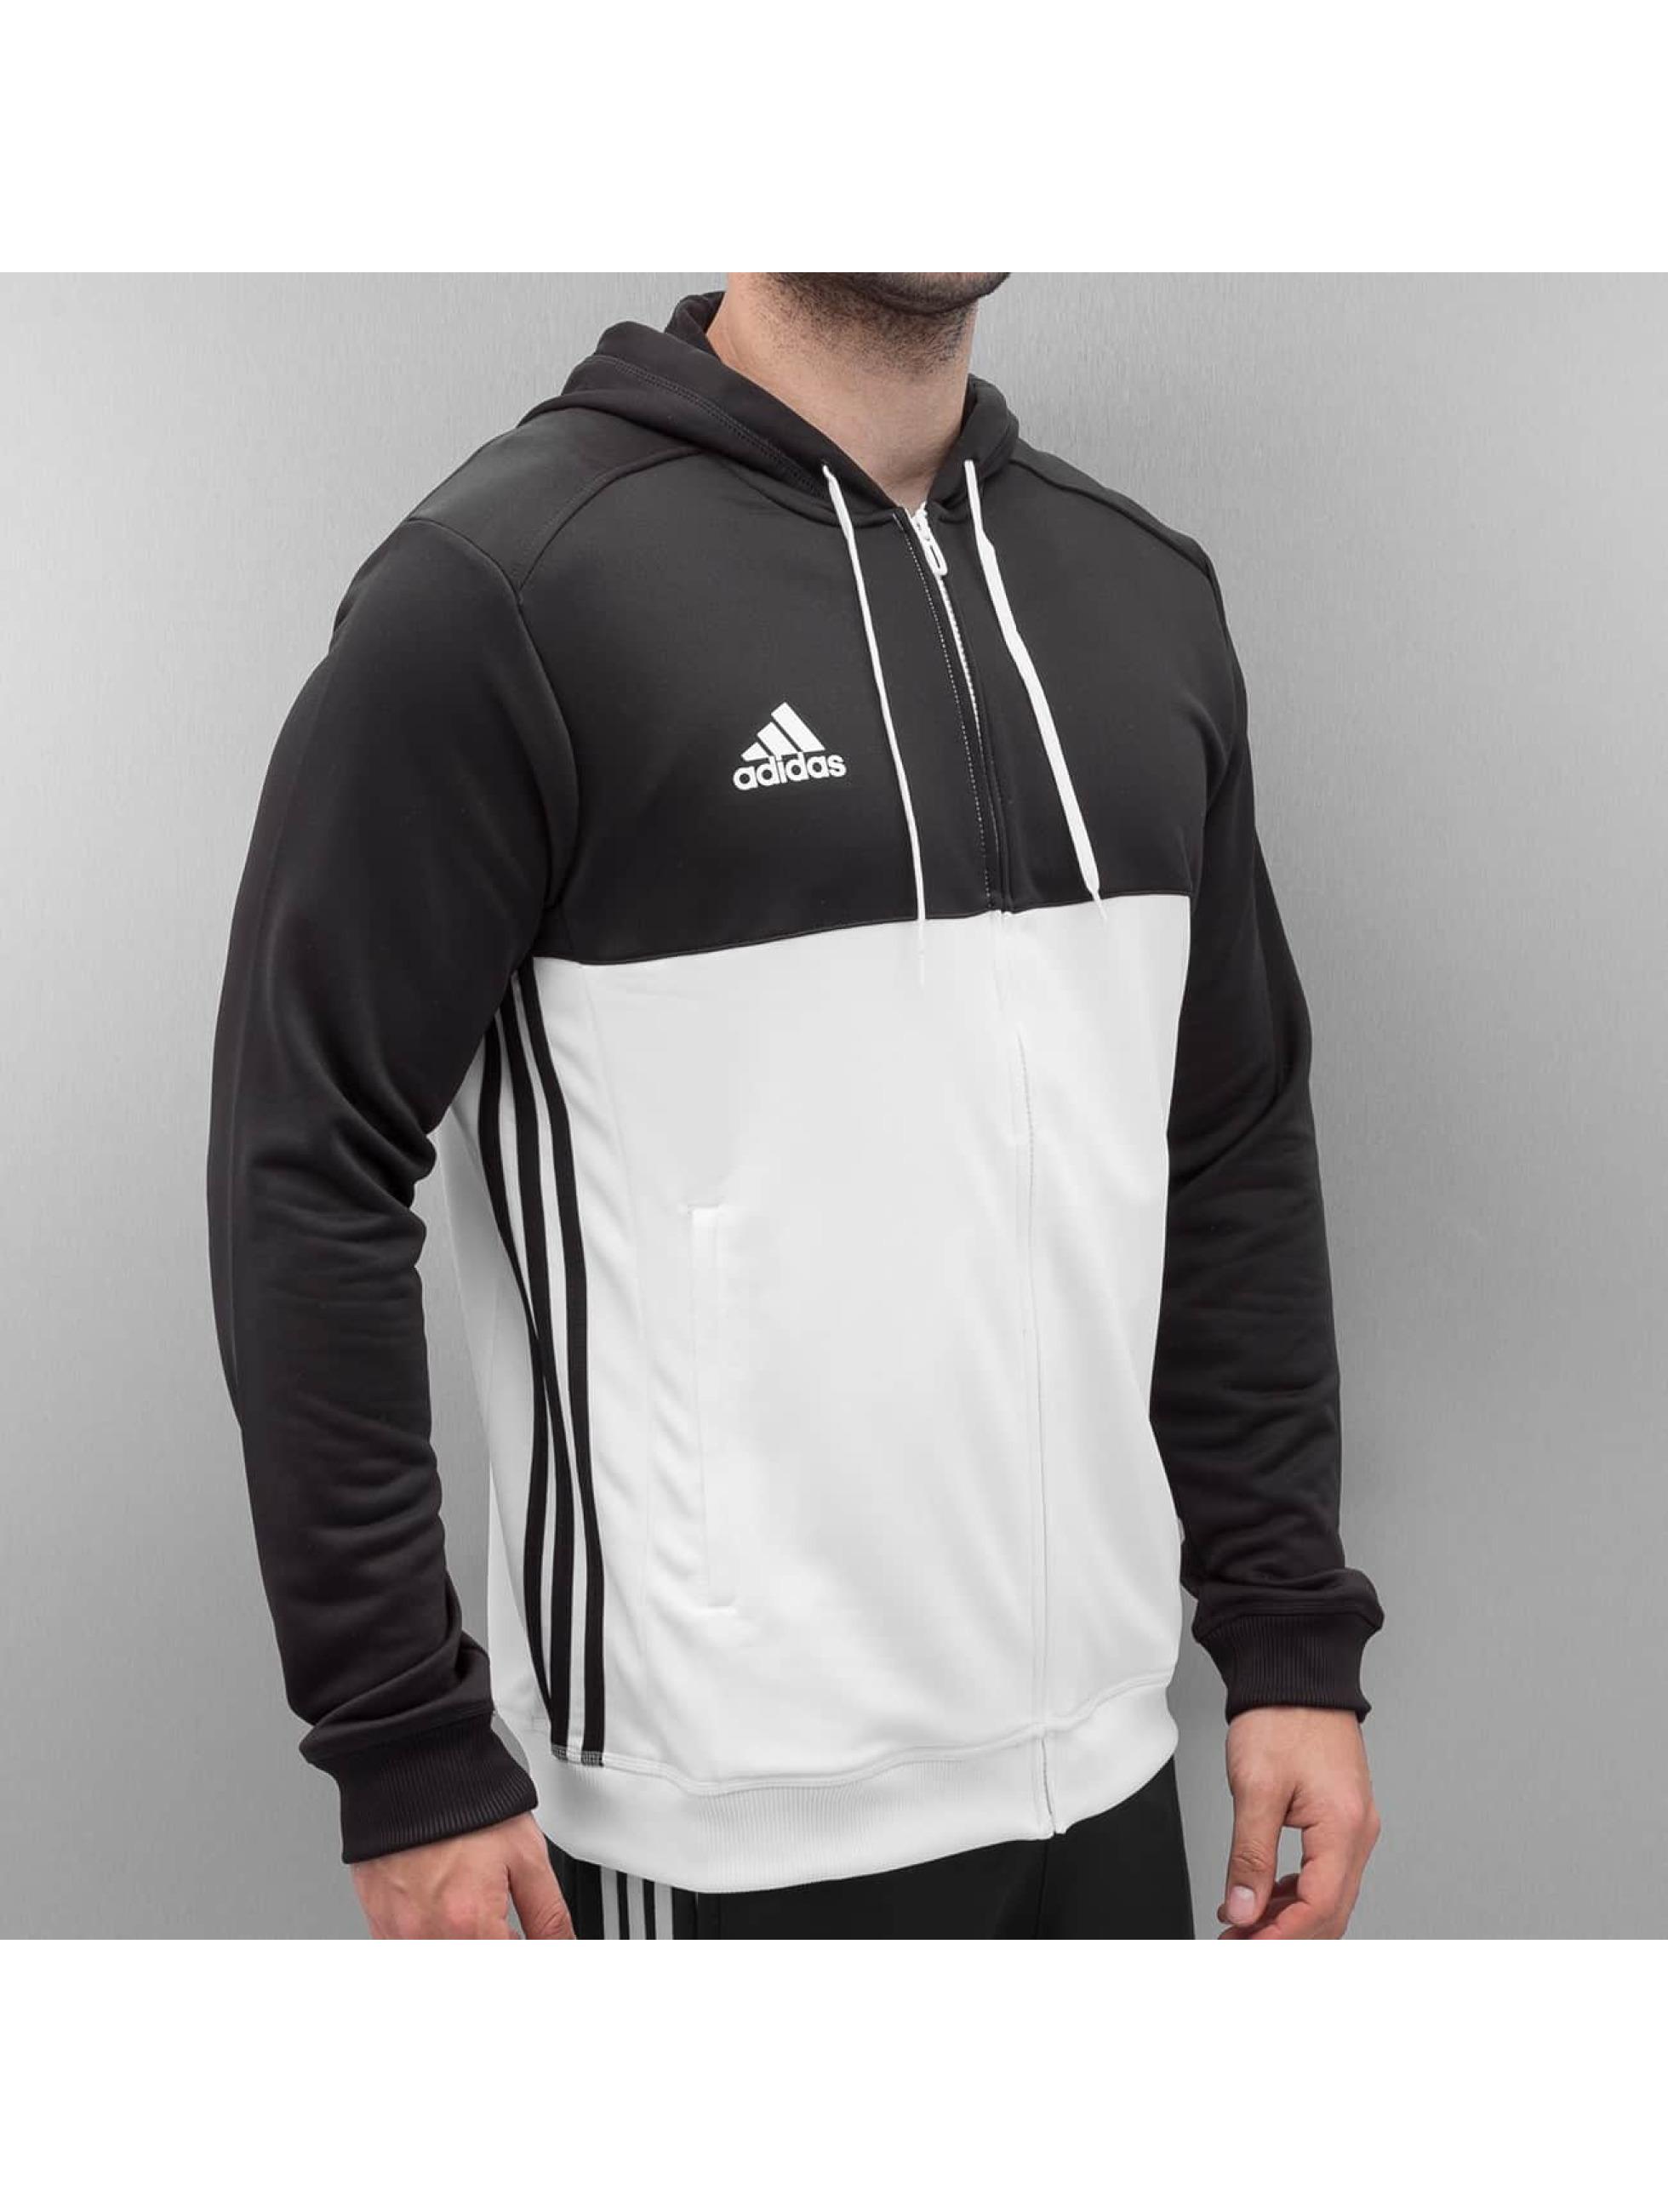 adidas Boxing MMA Männer Übergangsjacke T16 Hooded in schwarz